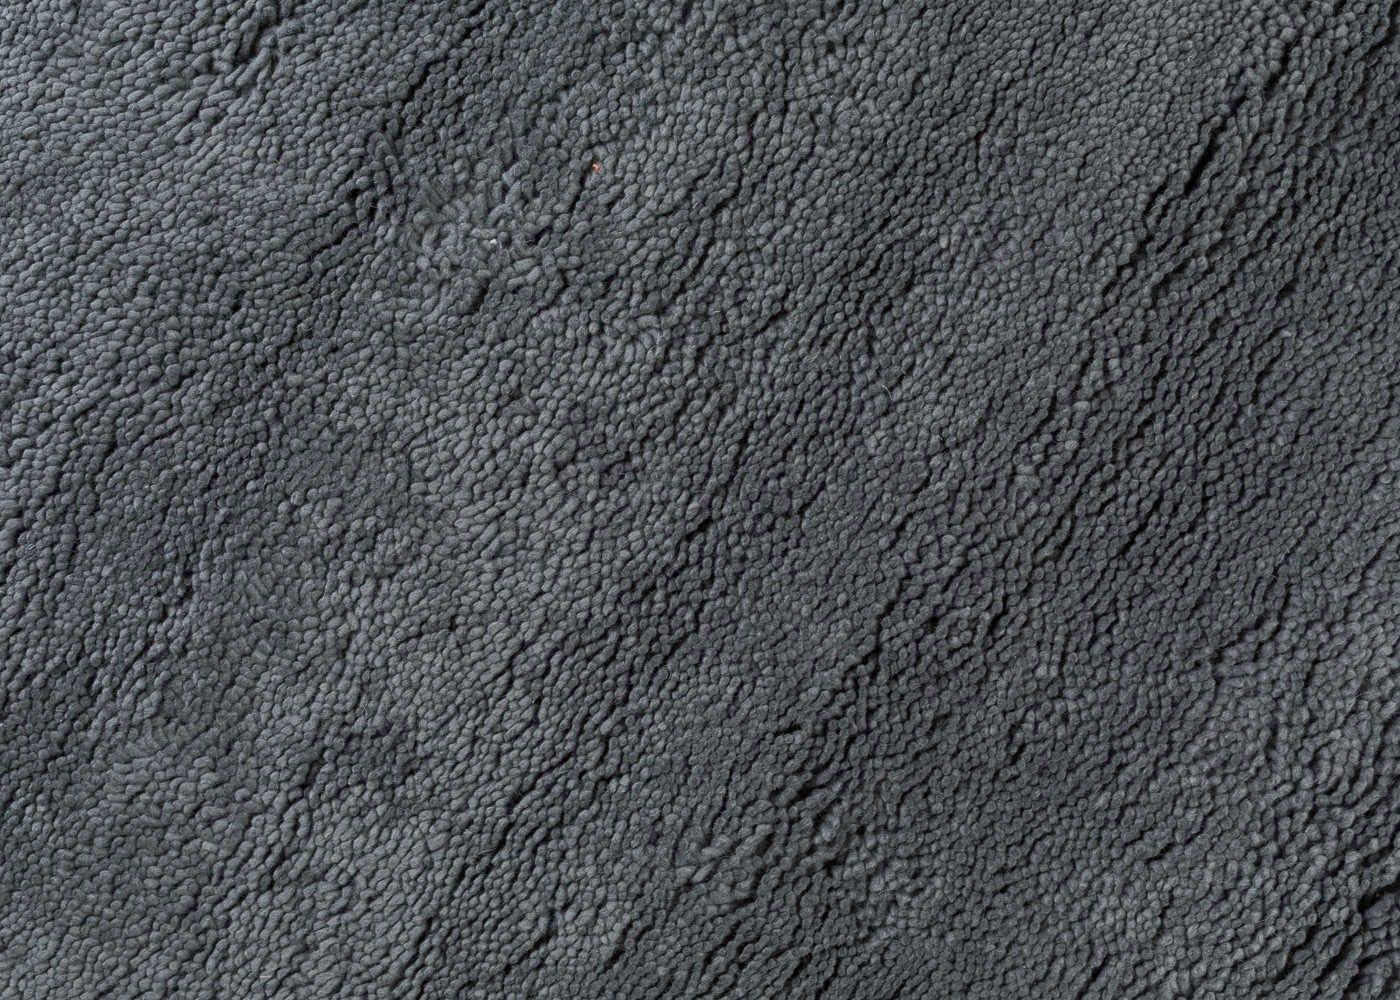 Jabara rug felted detail